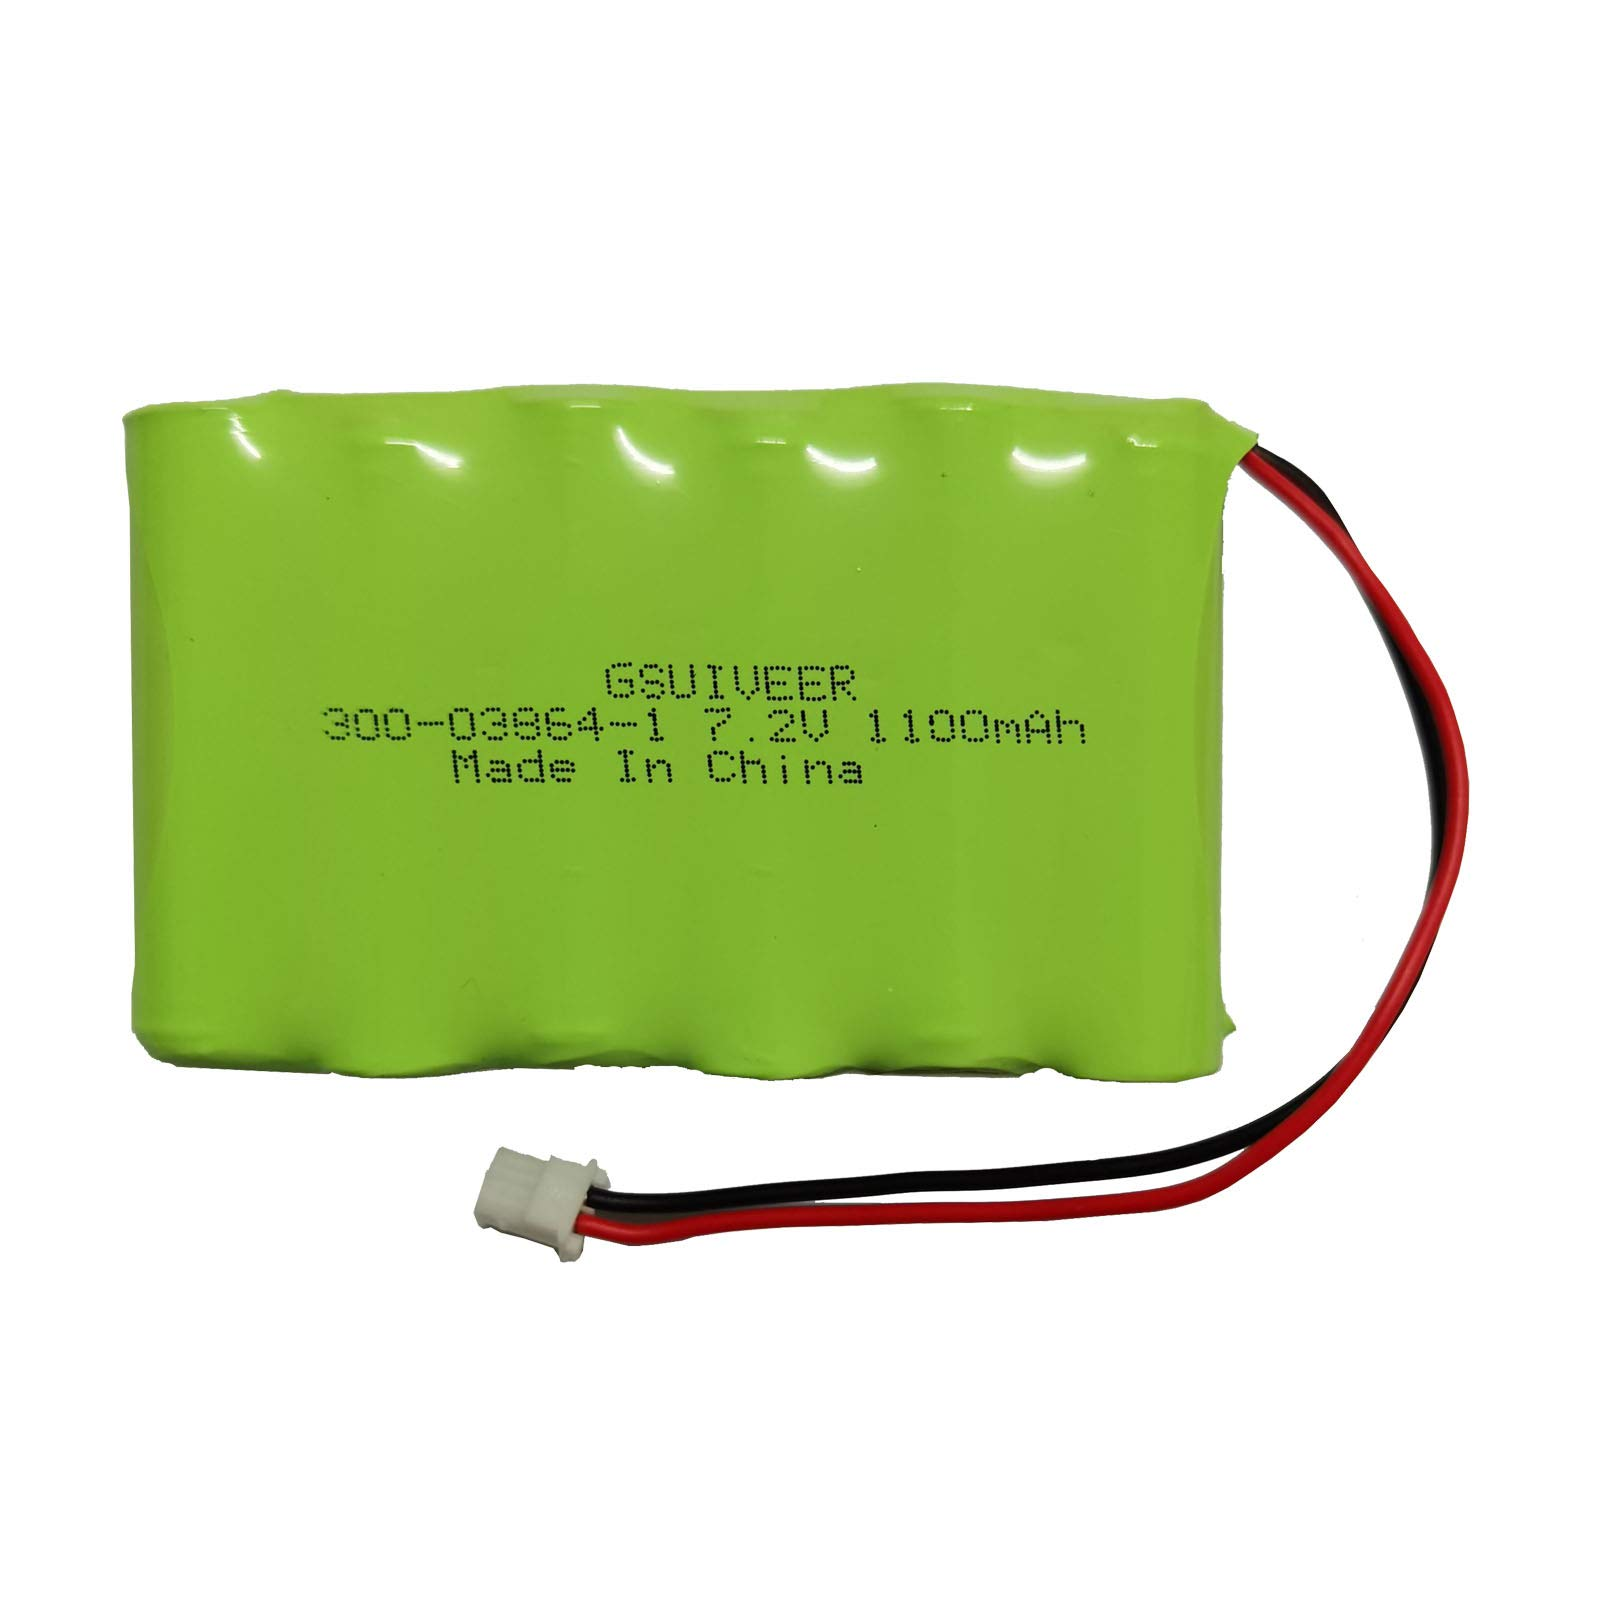 Bateria Para Honeywell Alarm Lynx WALYNX-RCHB-SC Honeywell L